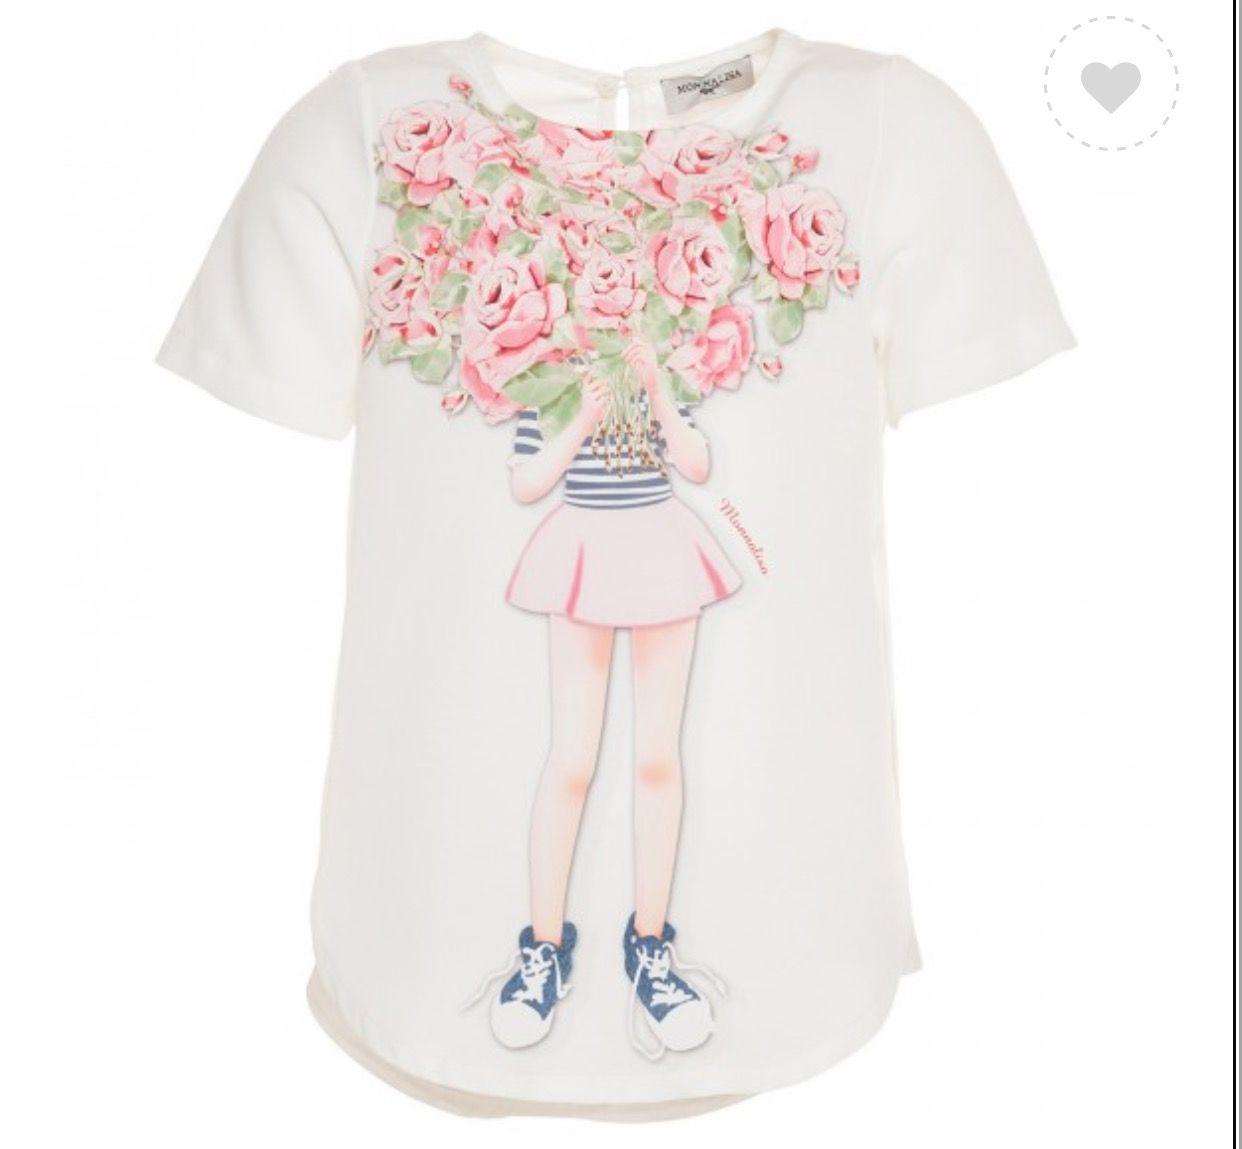 Pin de C.M. en Monnalisa dress   Pinterest   Ropa de niñas y Ropa